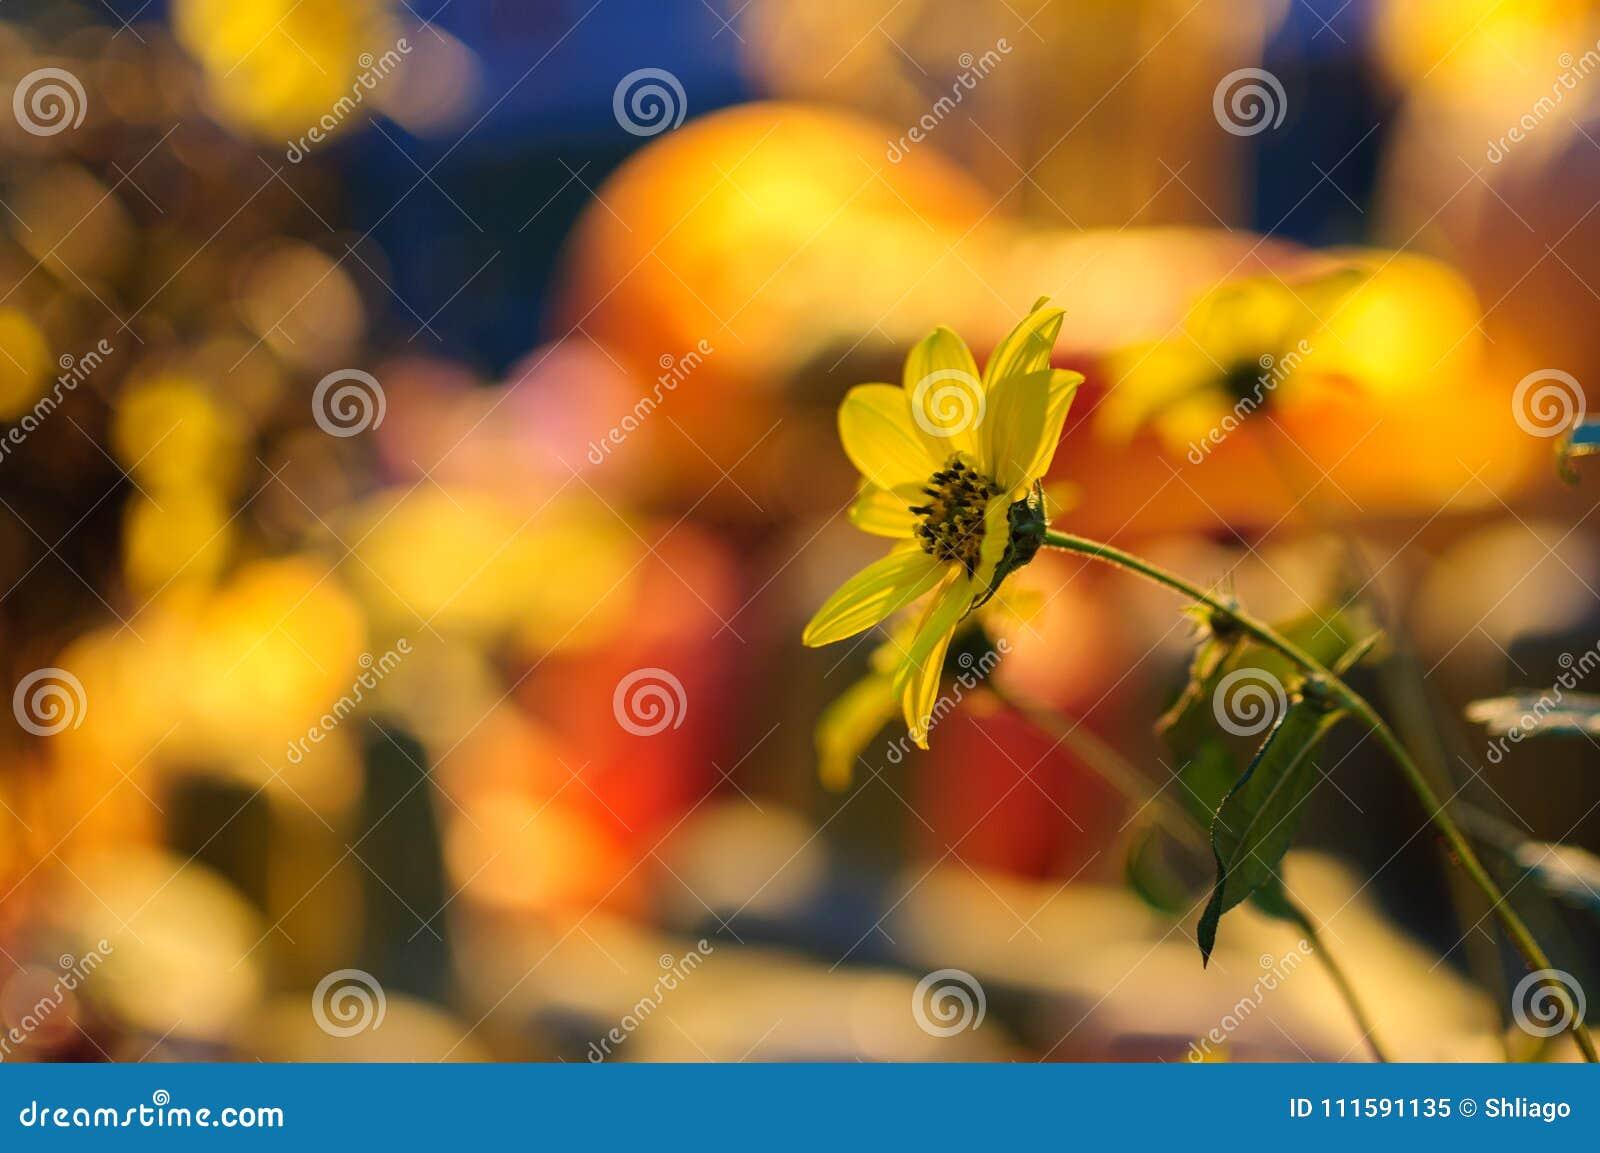 Rudbeckia, gloriosatusensköna, guld- tusensköna, gul tusensköna eller gulingprästkrage